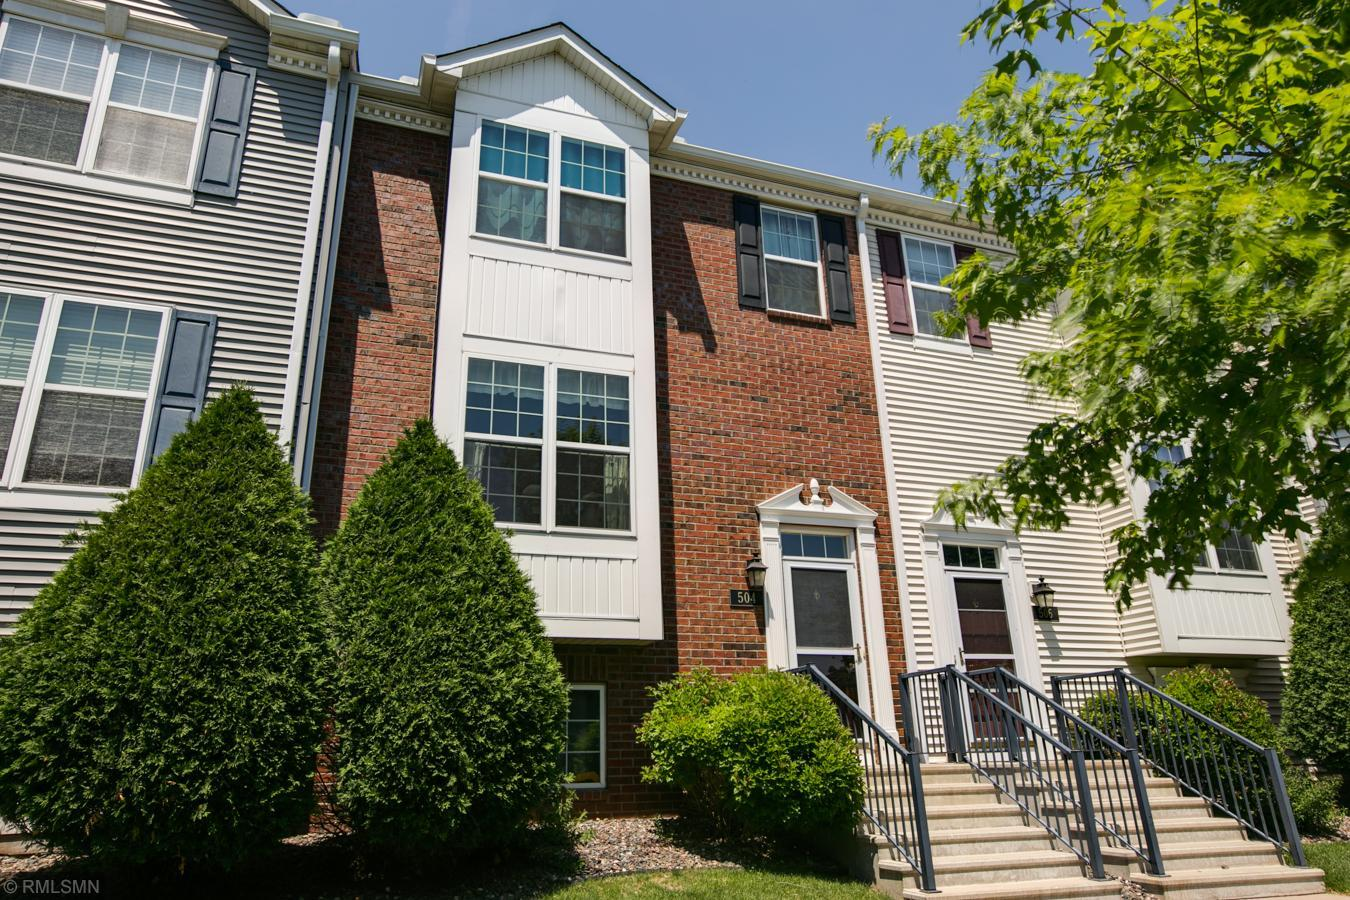 504 Village Property Photo - Circle Pines, MN real estate listing